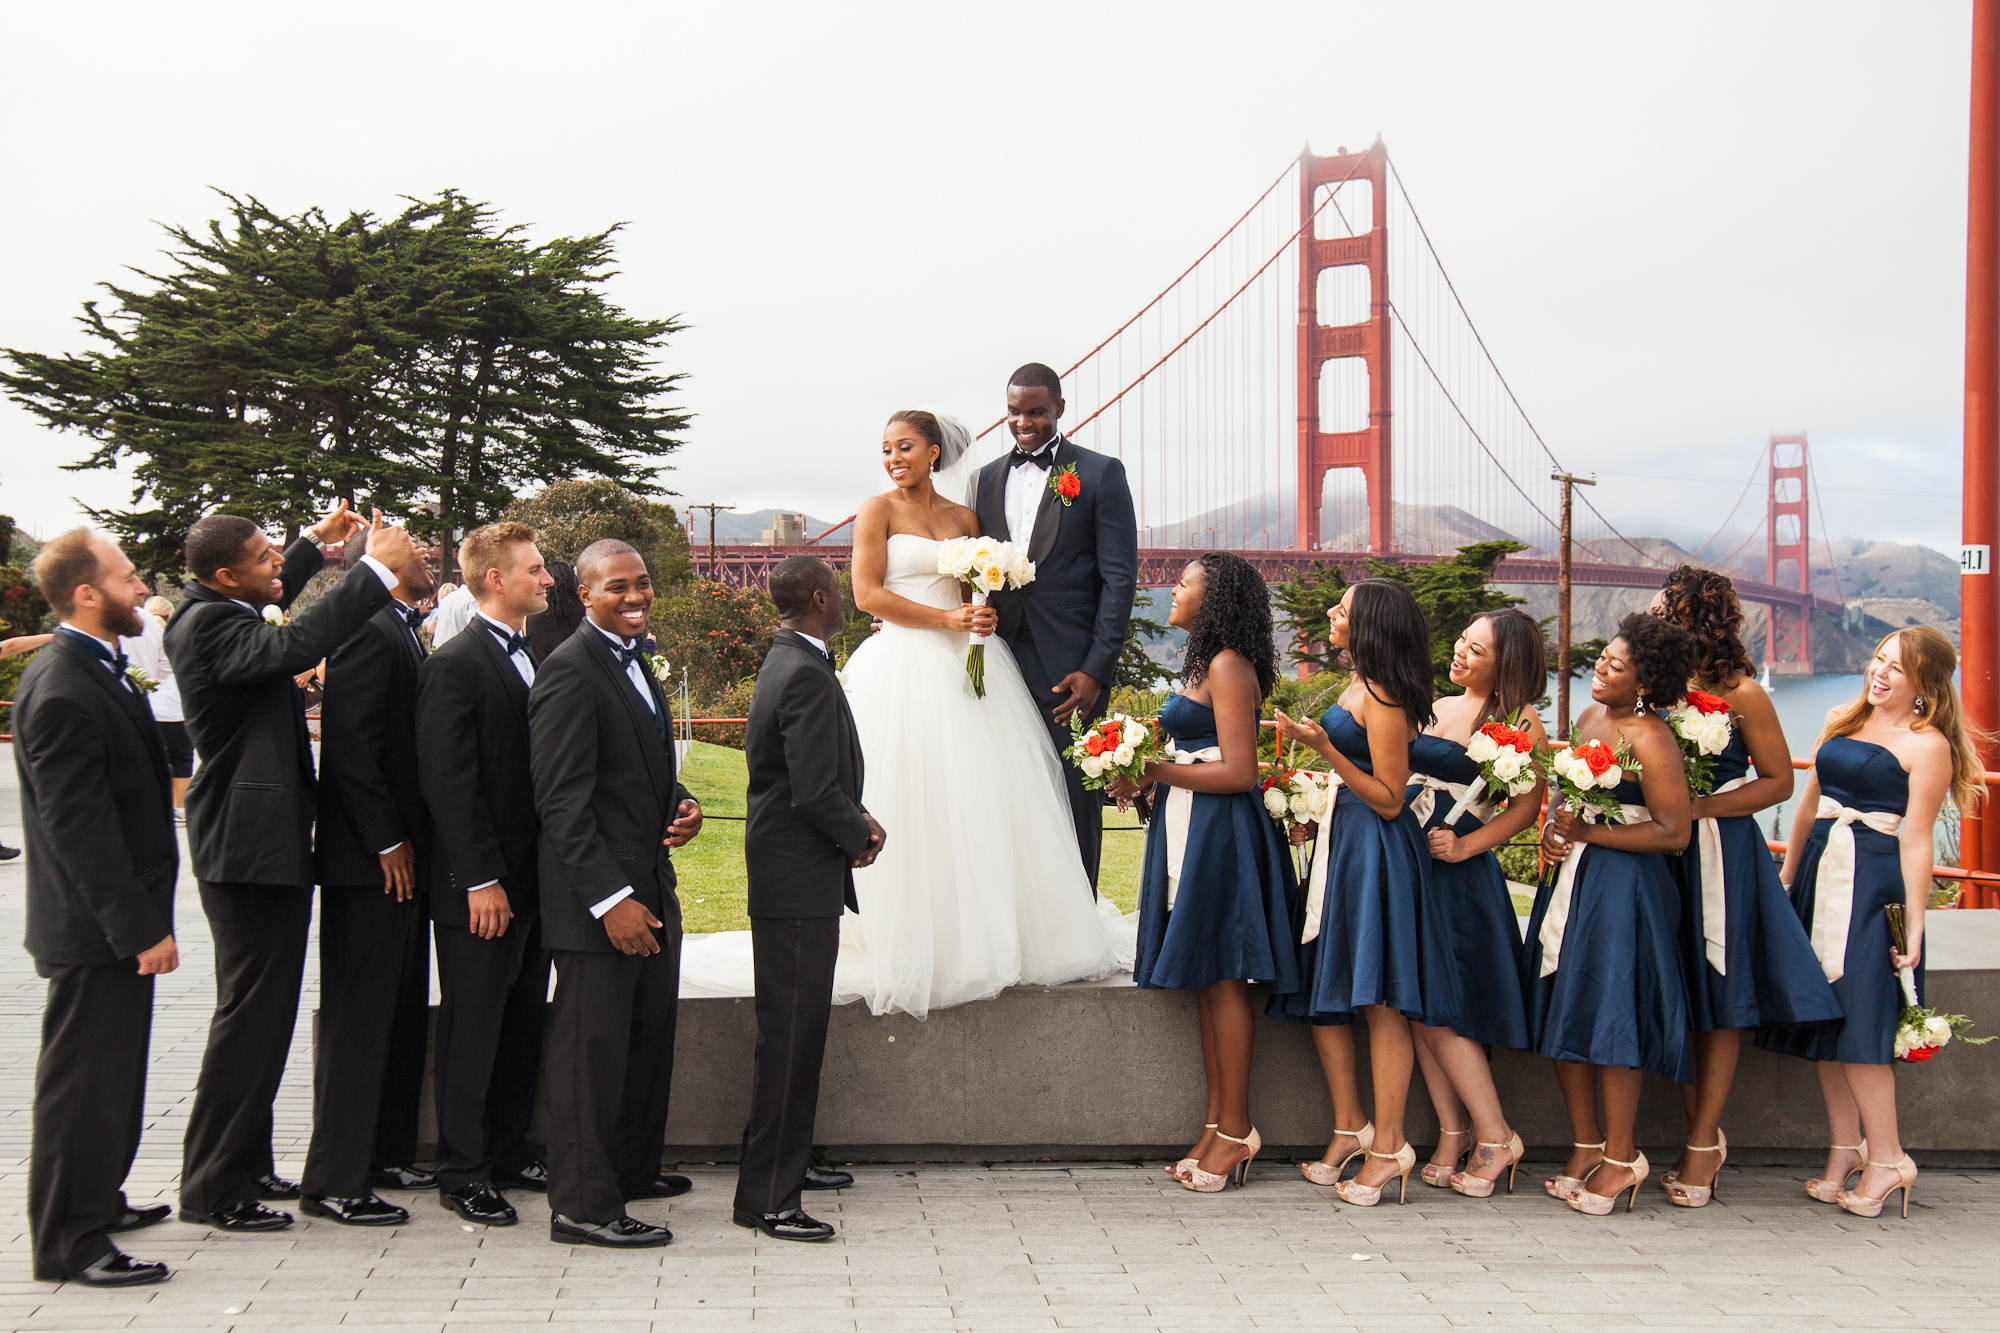 golden gate bridge wedding party